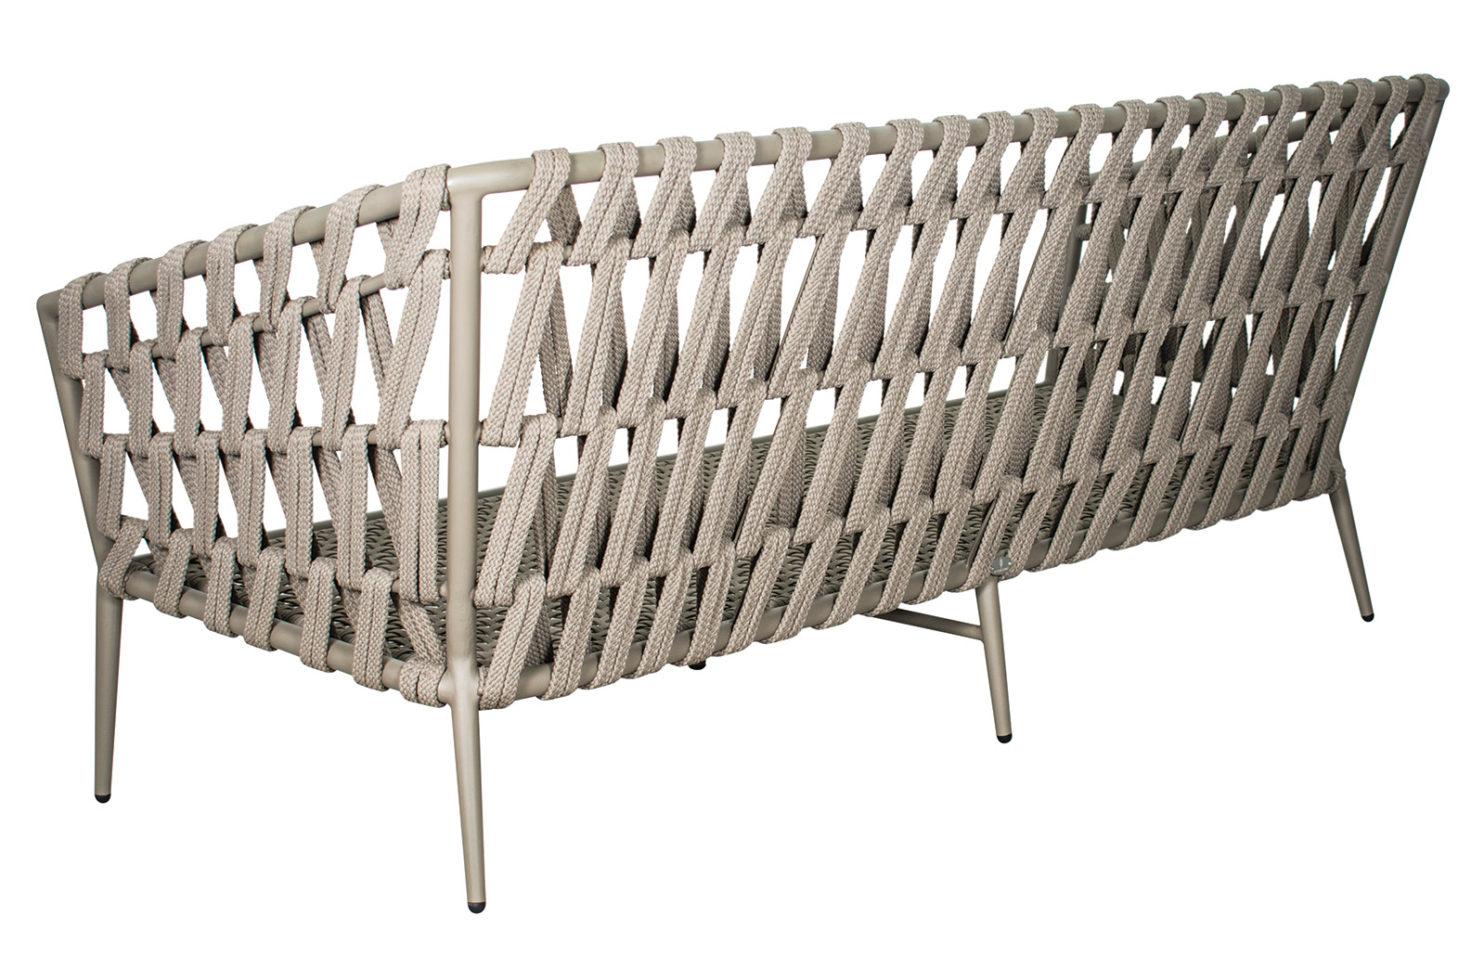 Archipelago andaman sofa 620FT066P2LGT frame 1 3Q back